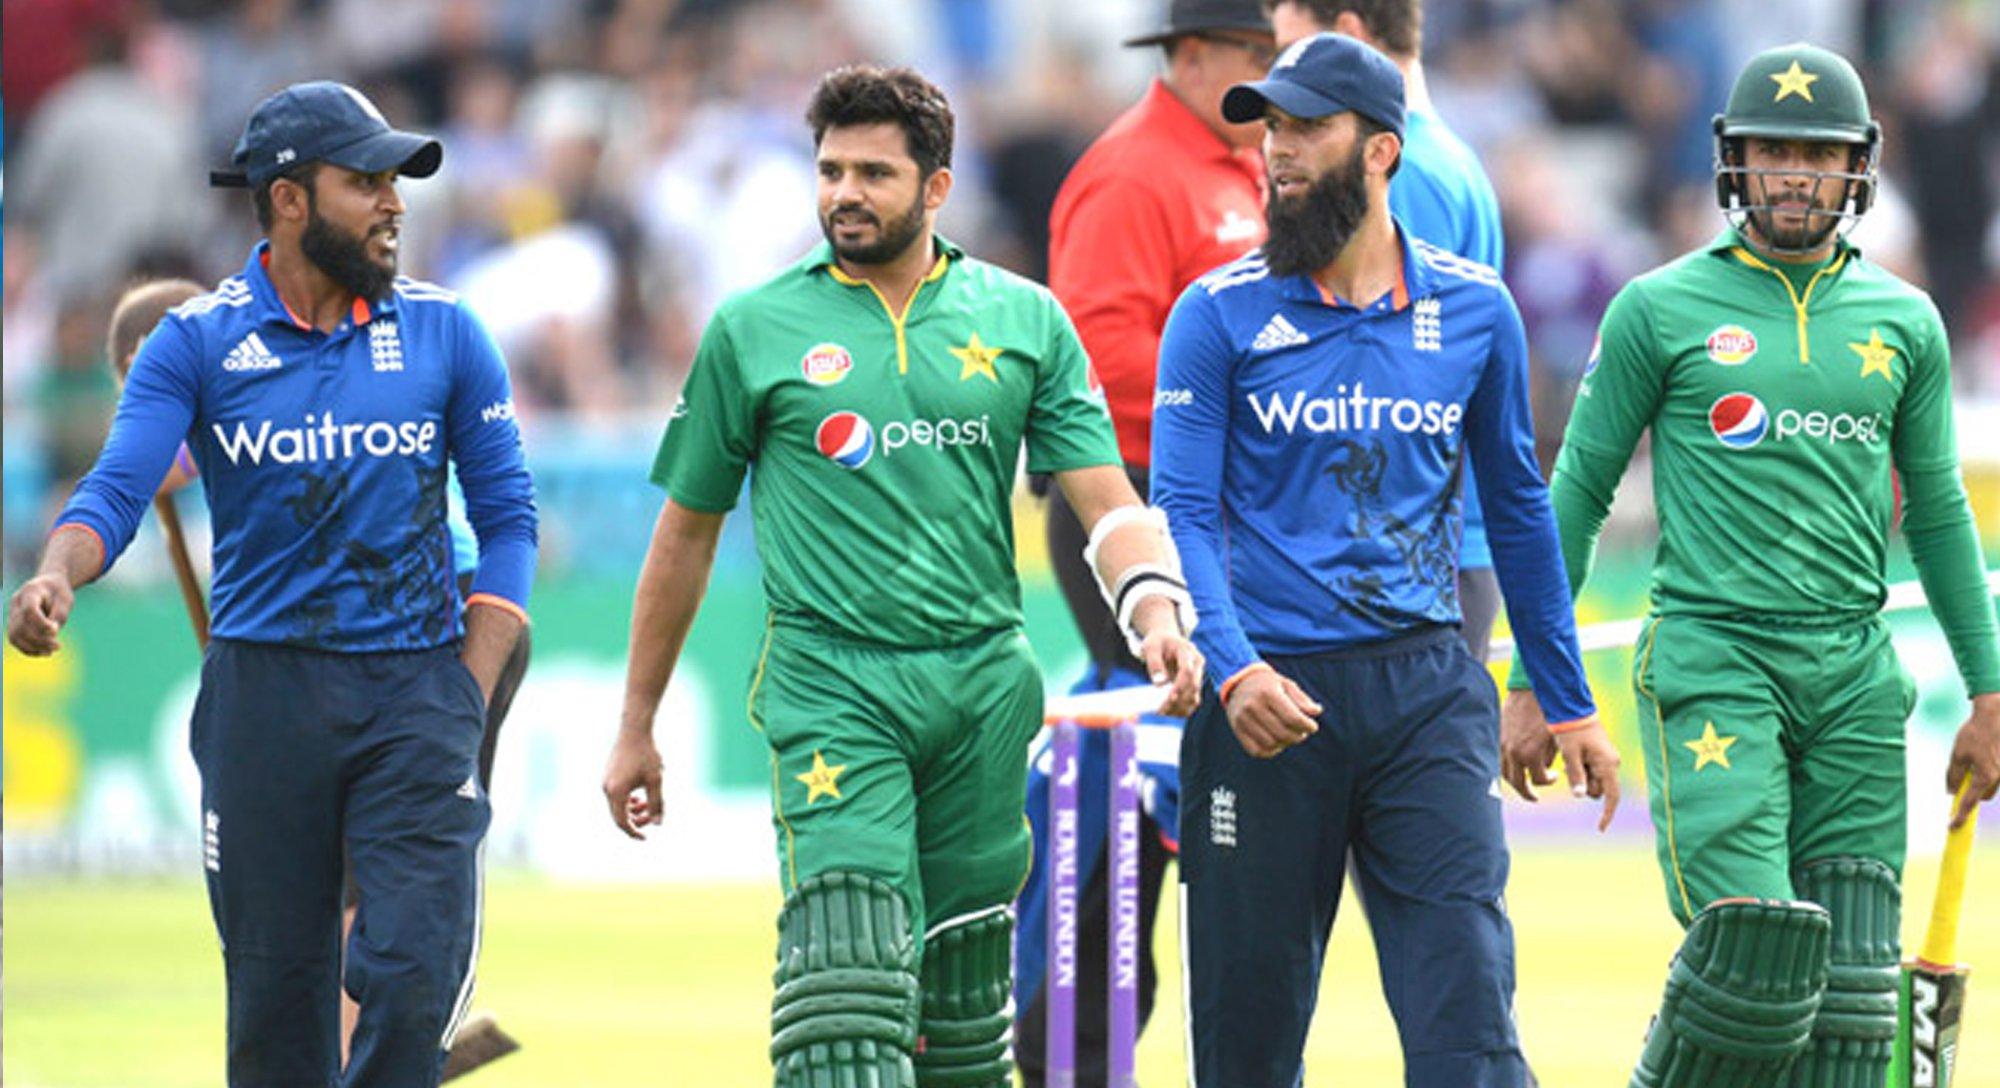 pakistan vs england 2019 க்கான பட முடிவு